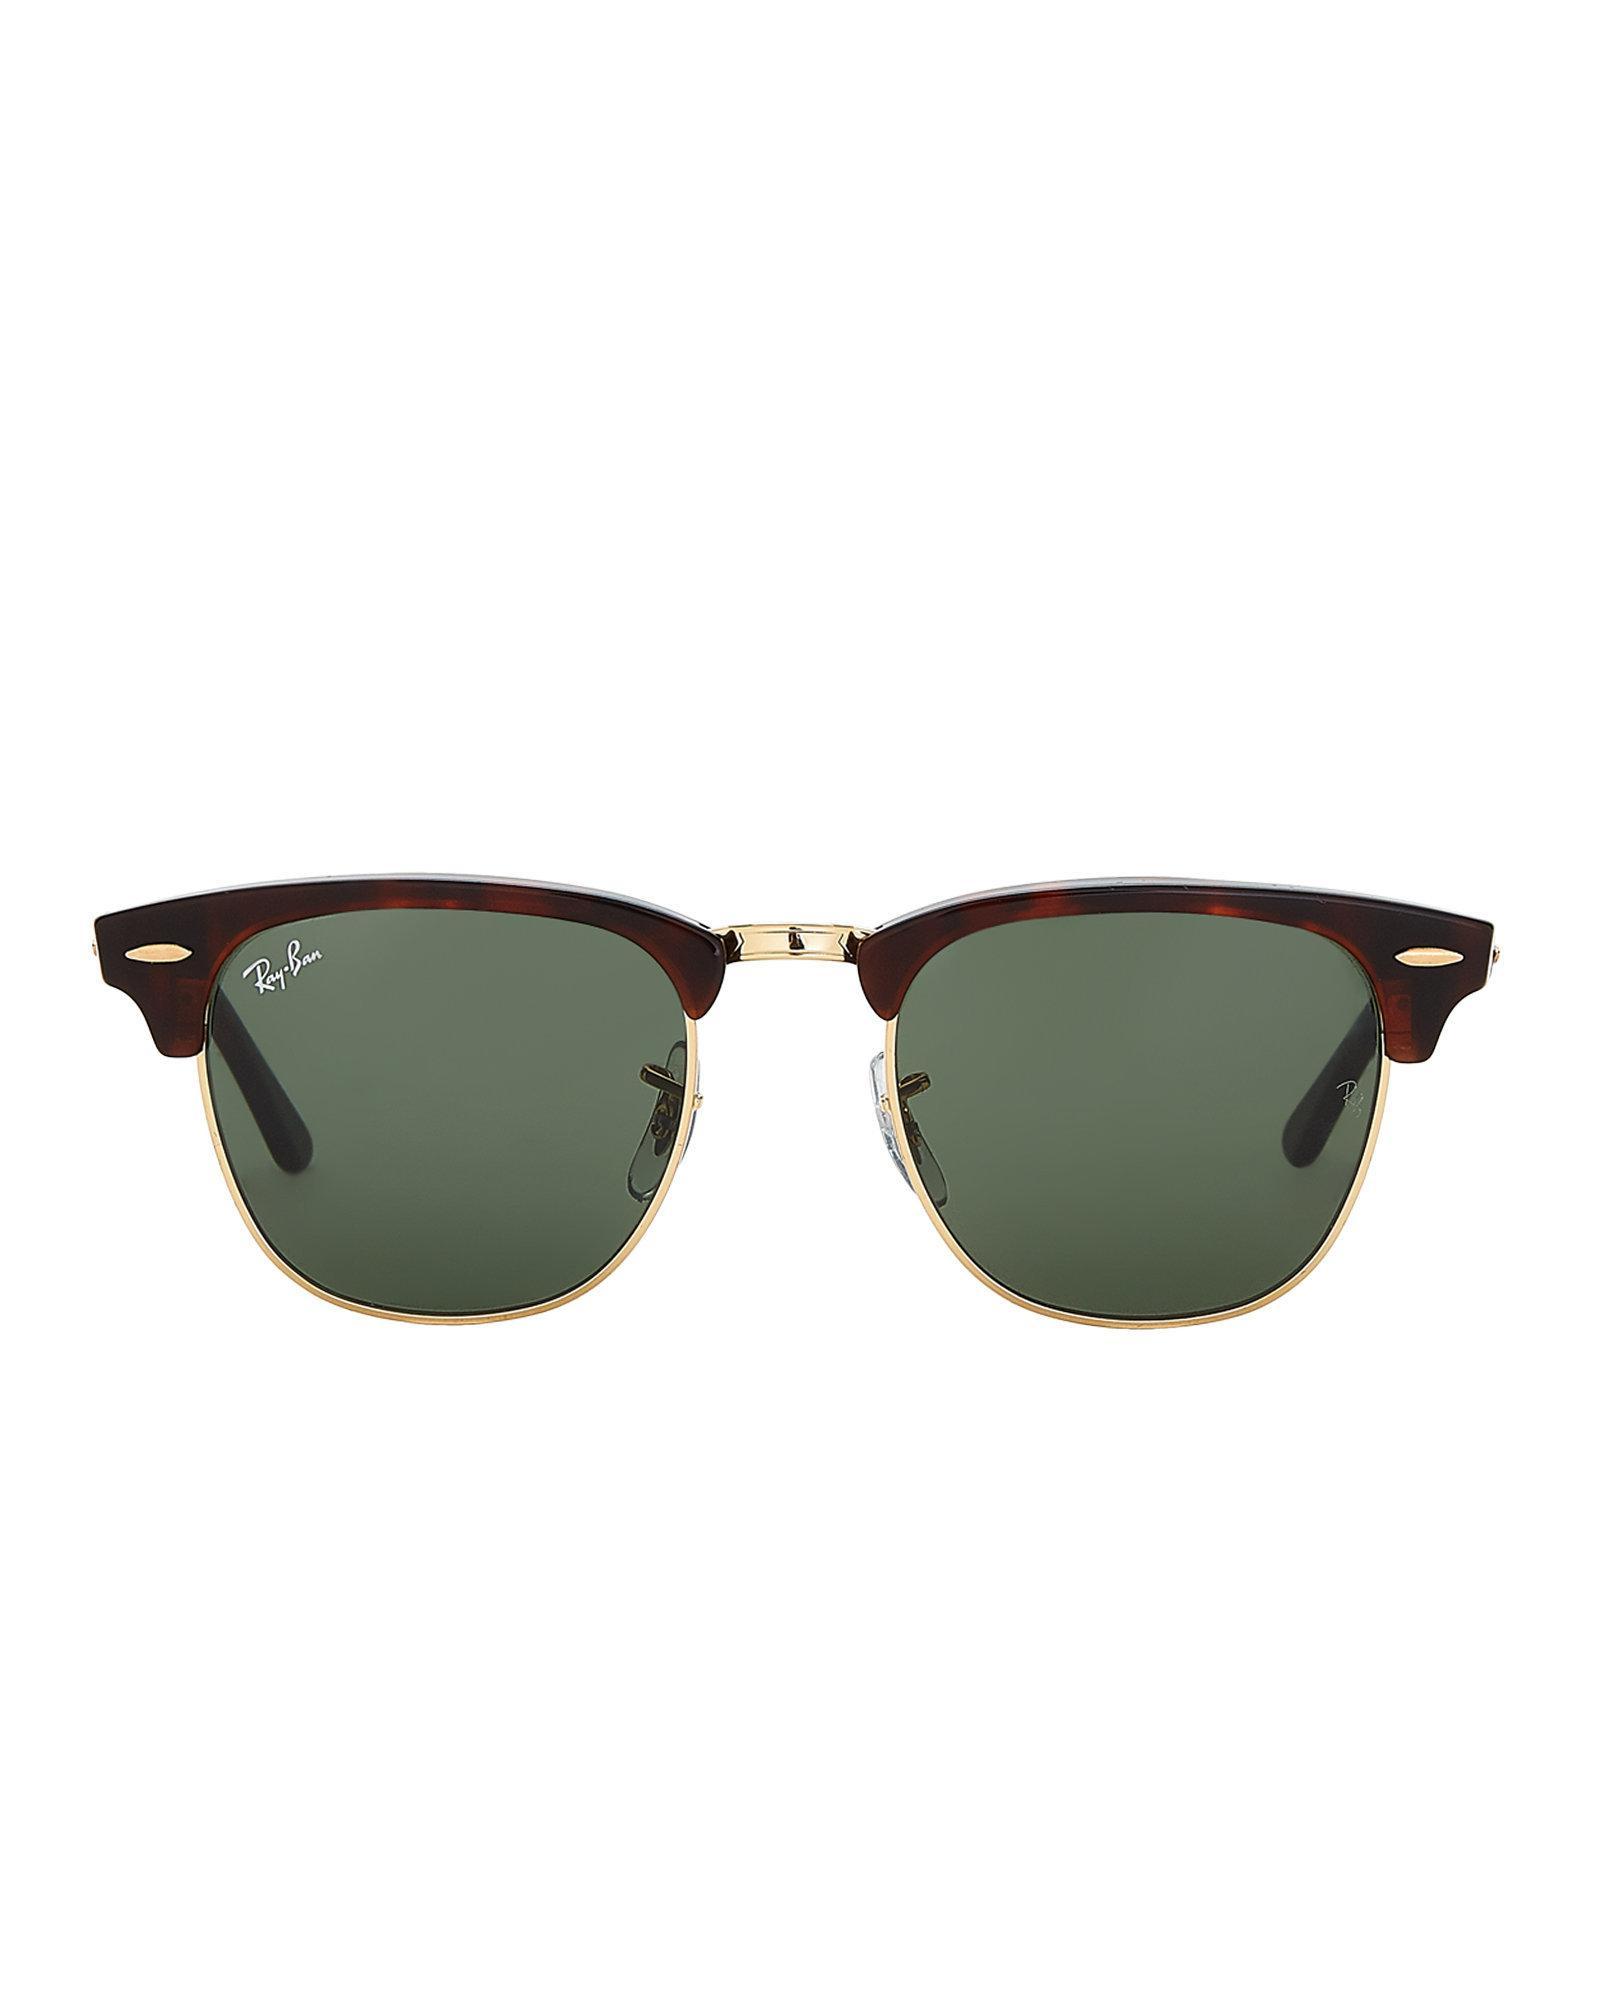 59de8bdee8 Lyst - Ray-Ban Rb 3016 Tortoiseshell-look Clubmaster Sunglasses